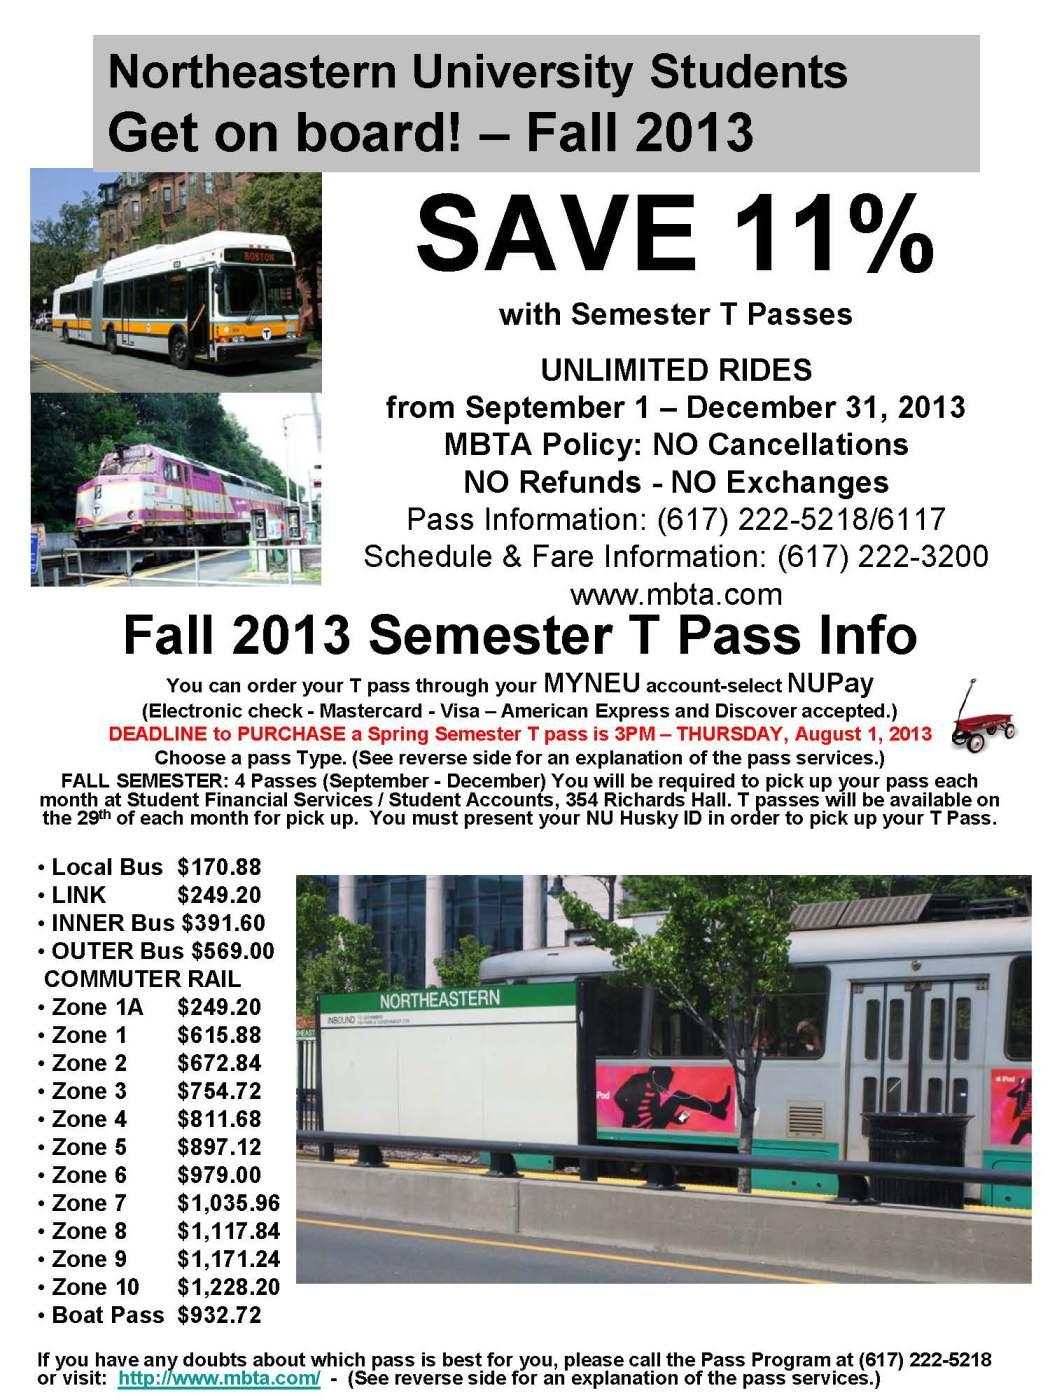 MBTA Discounted Semester T-Pass  via NUpay